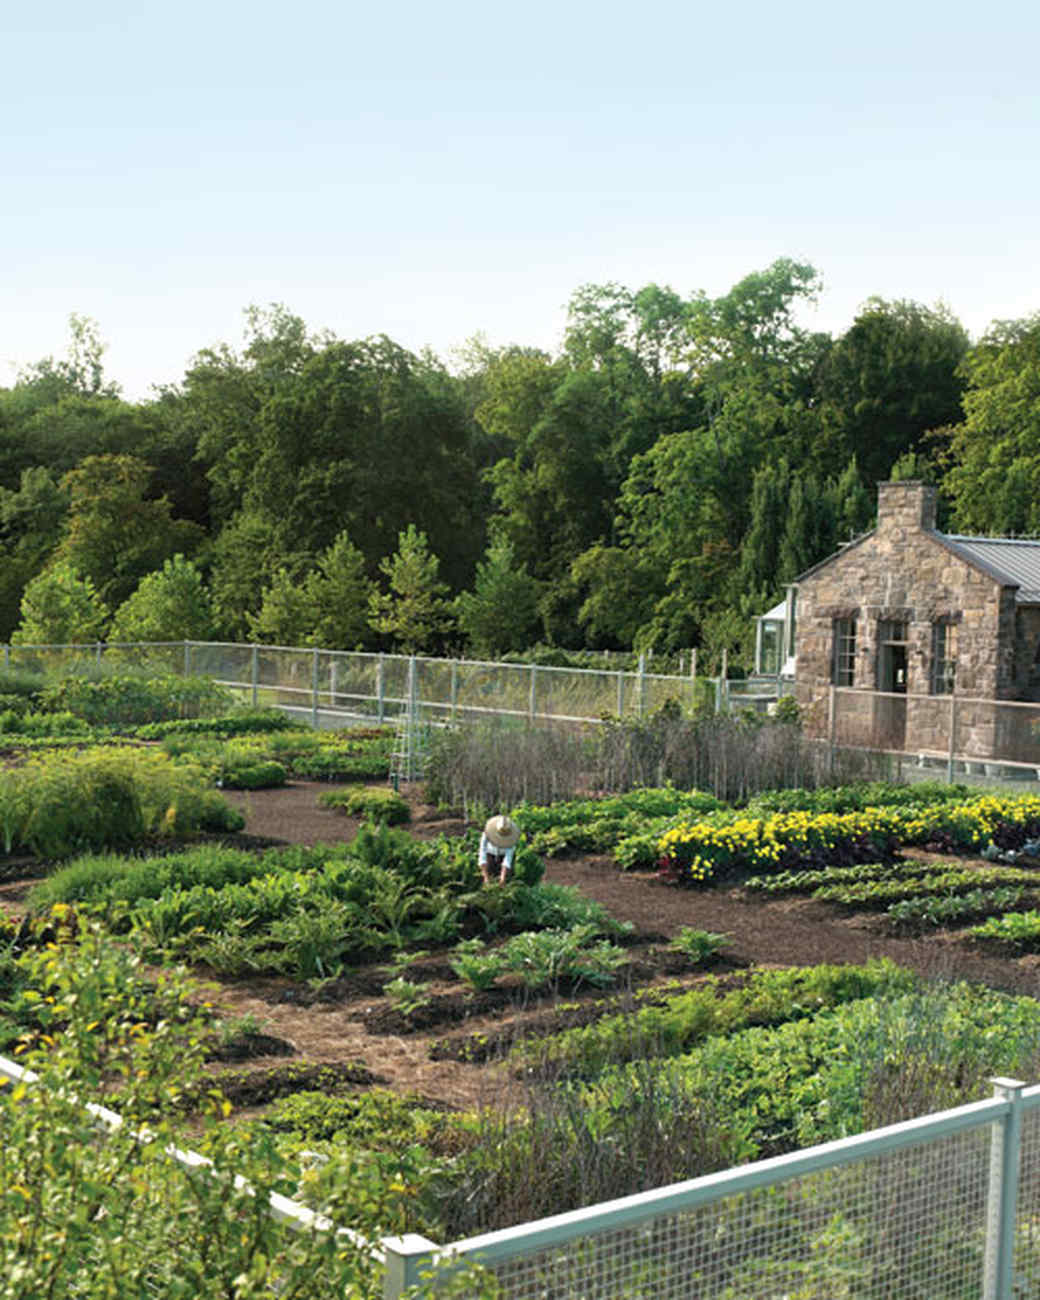 mld103321_0308_garden.jpg